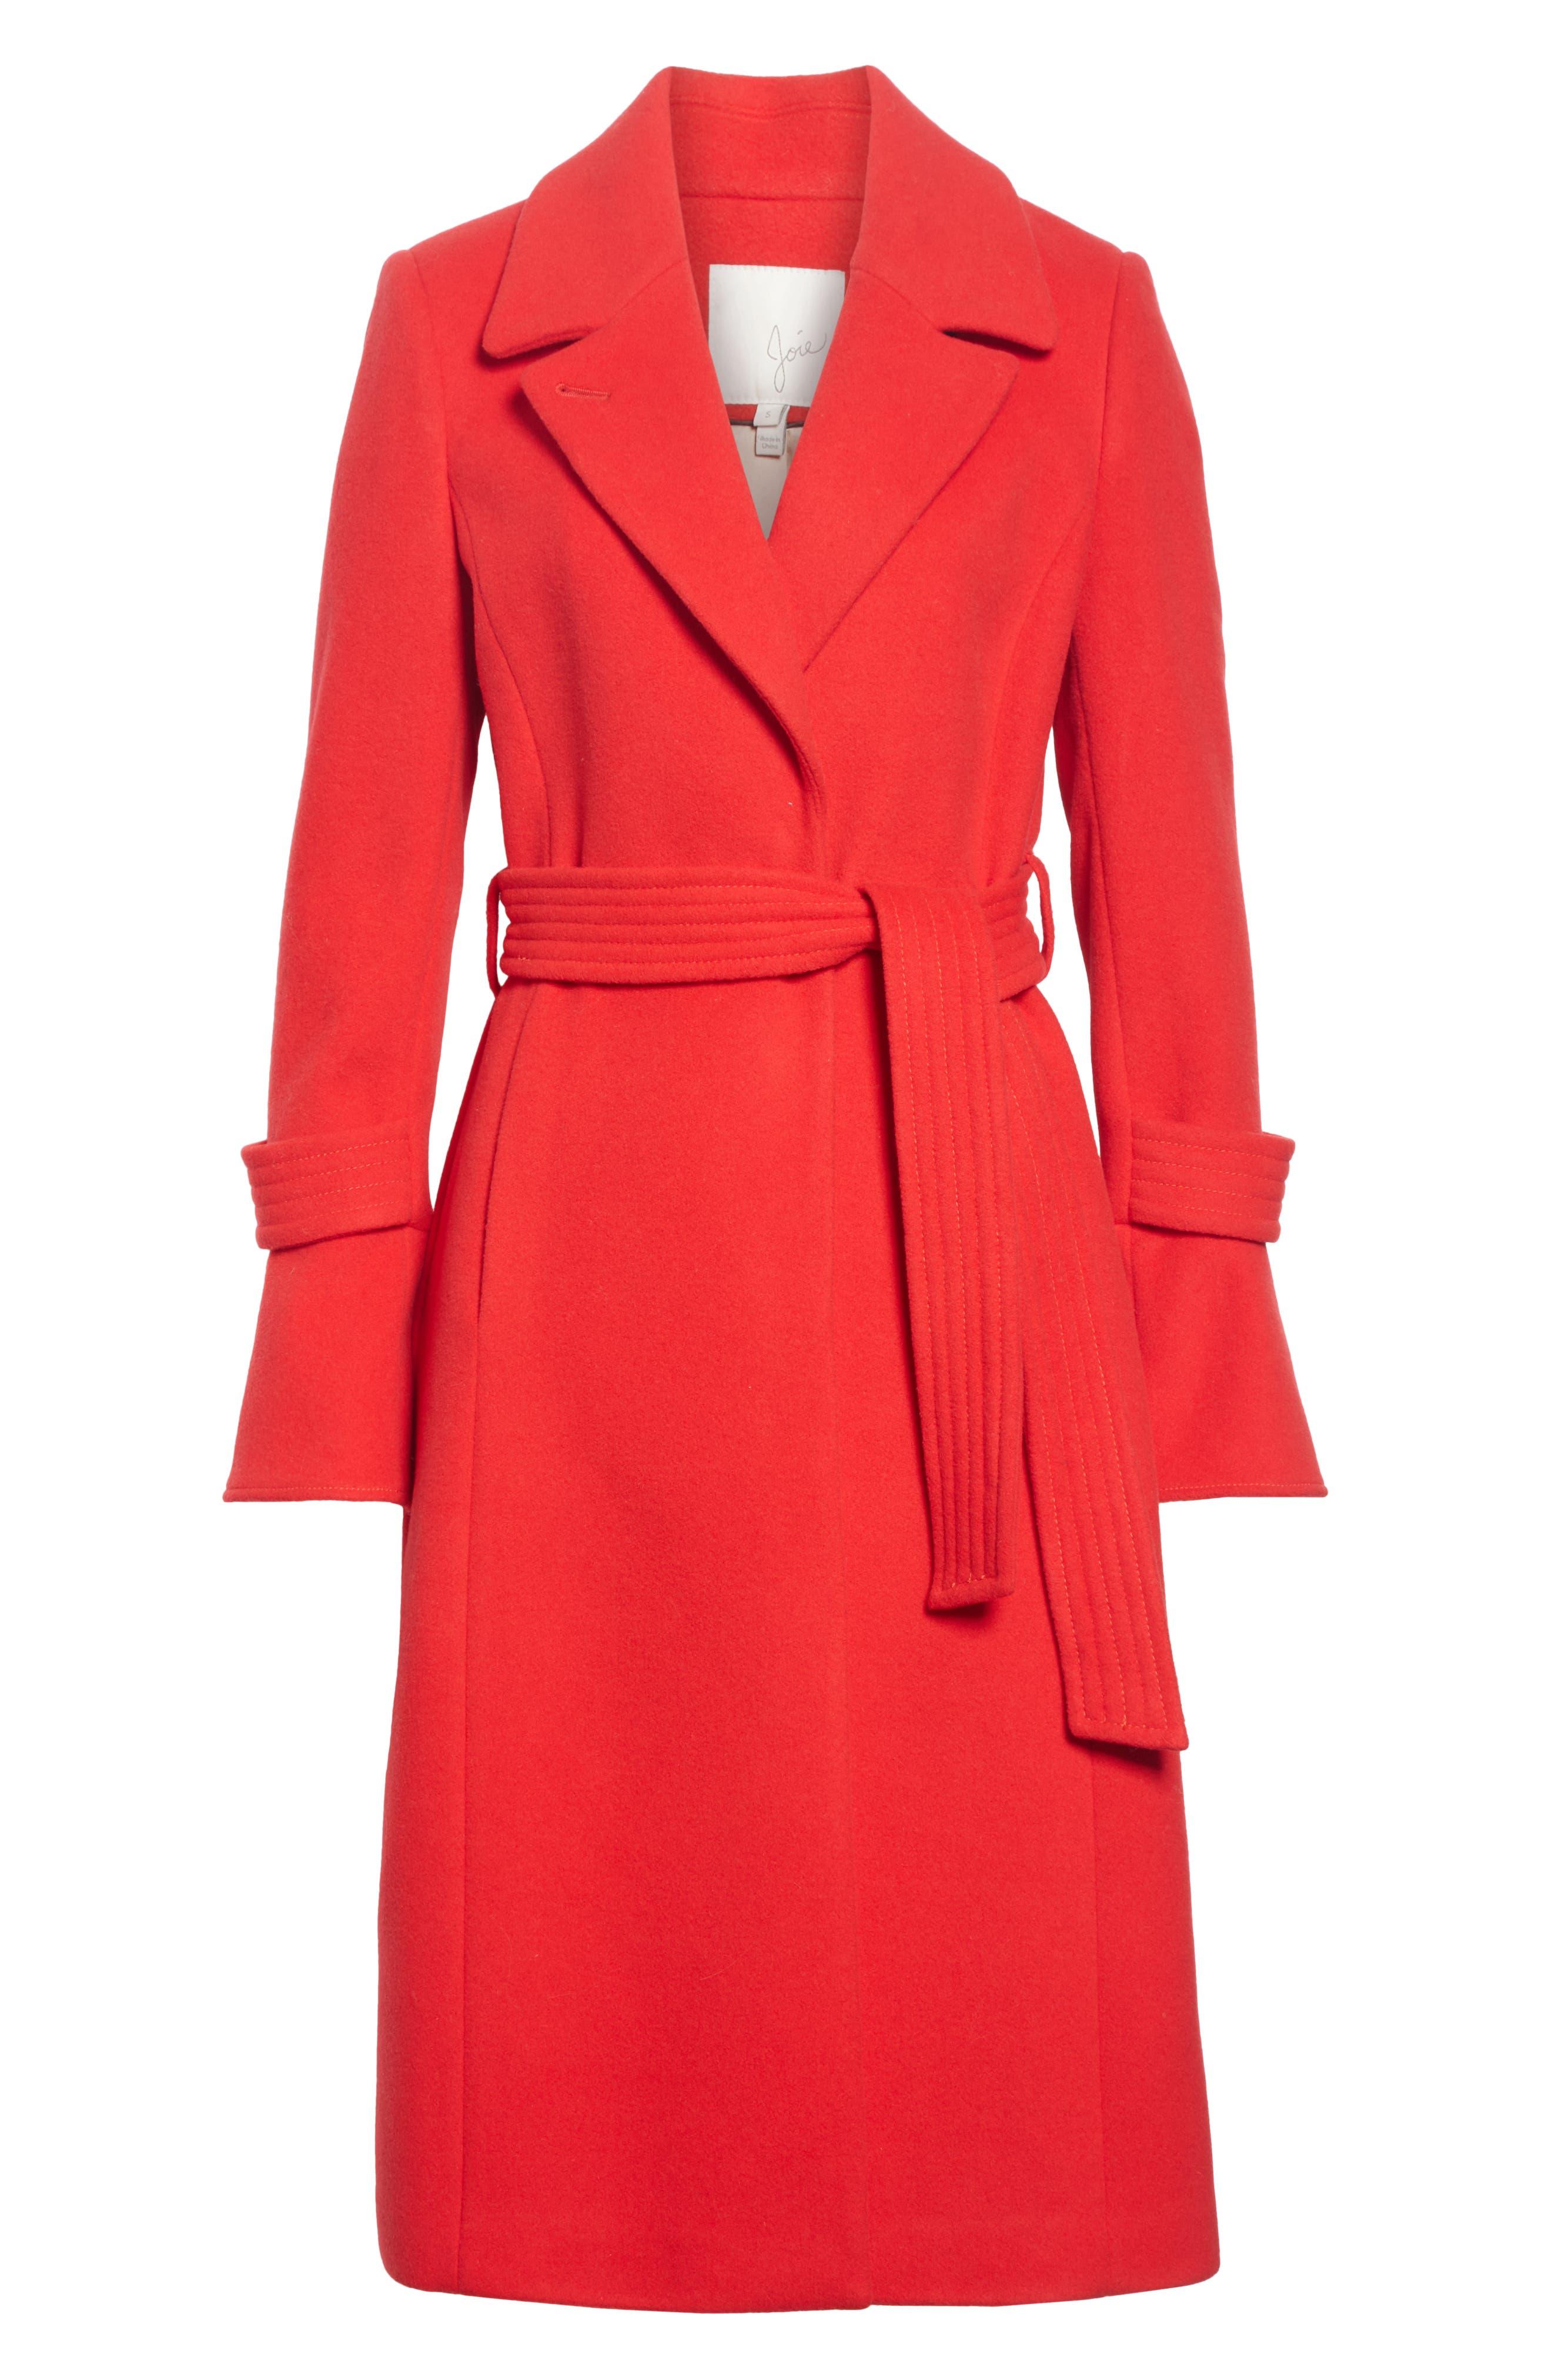 Hersilia Wool Blend Coat,                             Alternate thumbnail 5, color,                             600